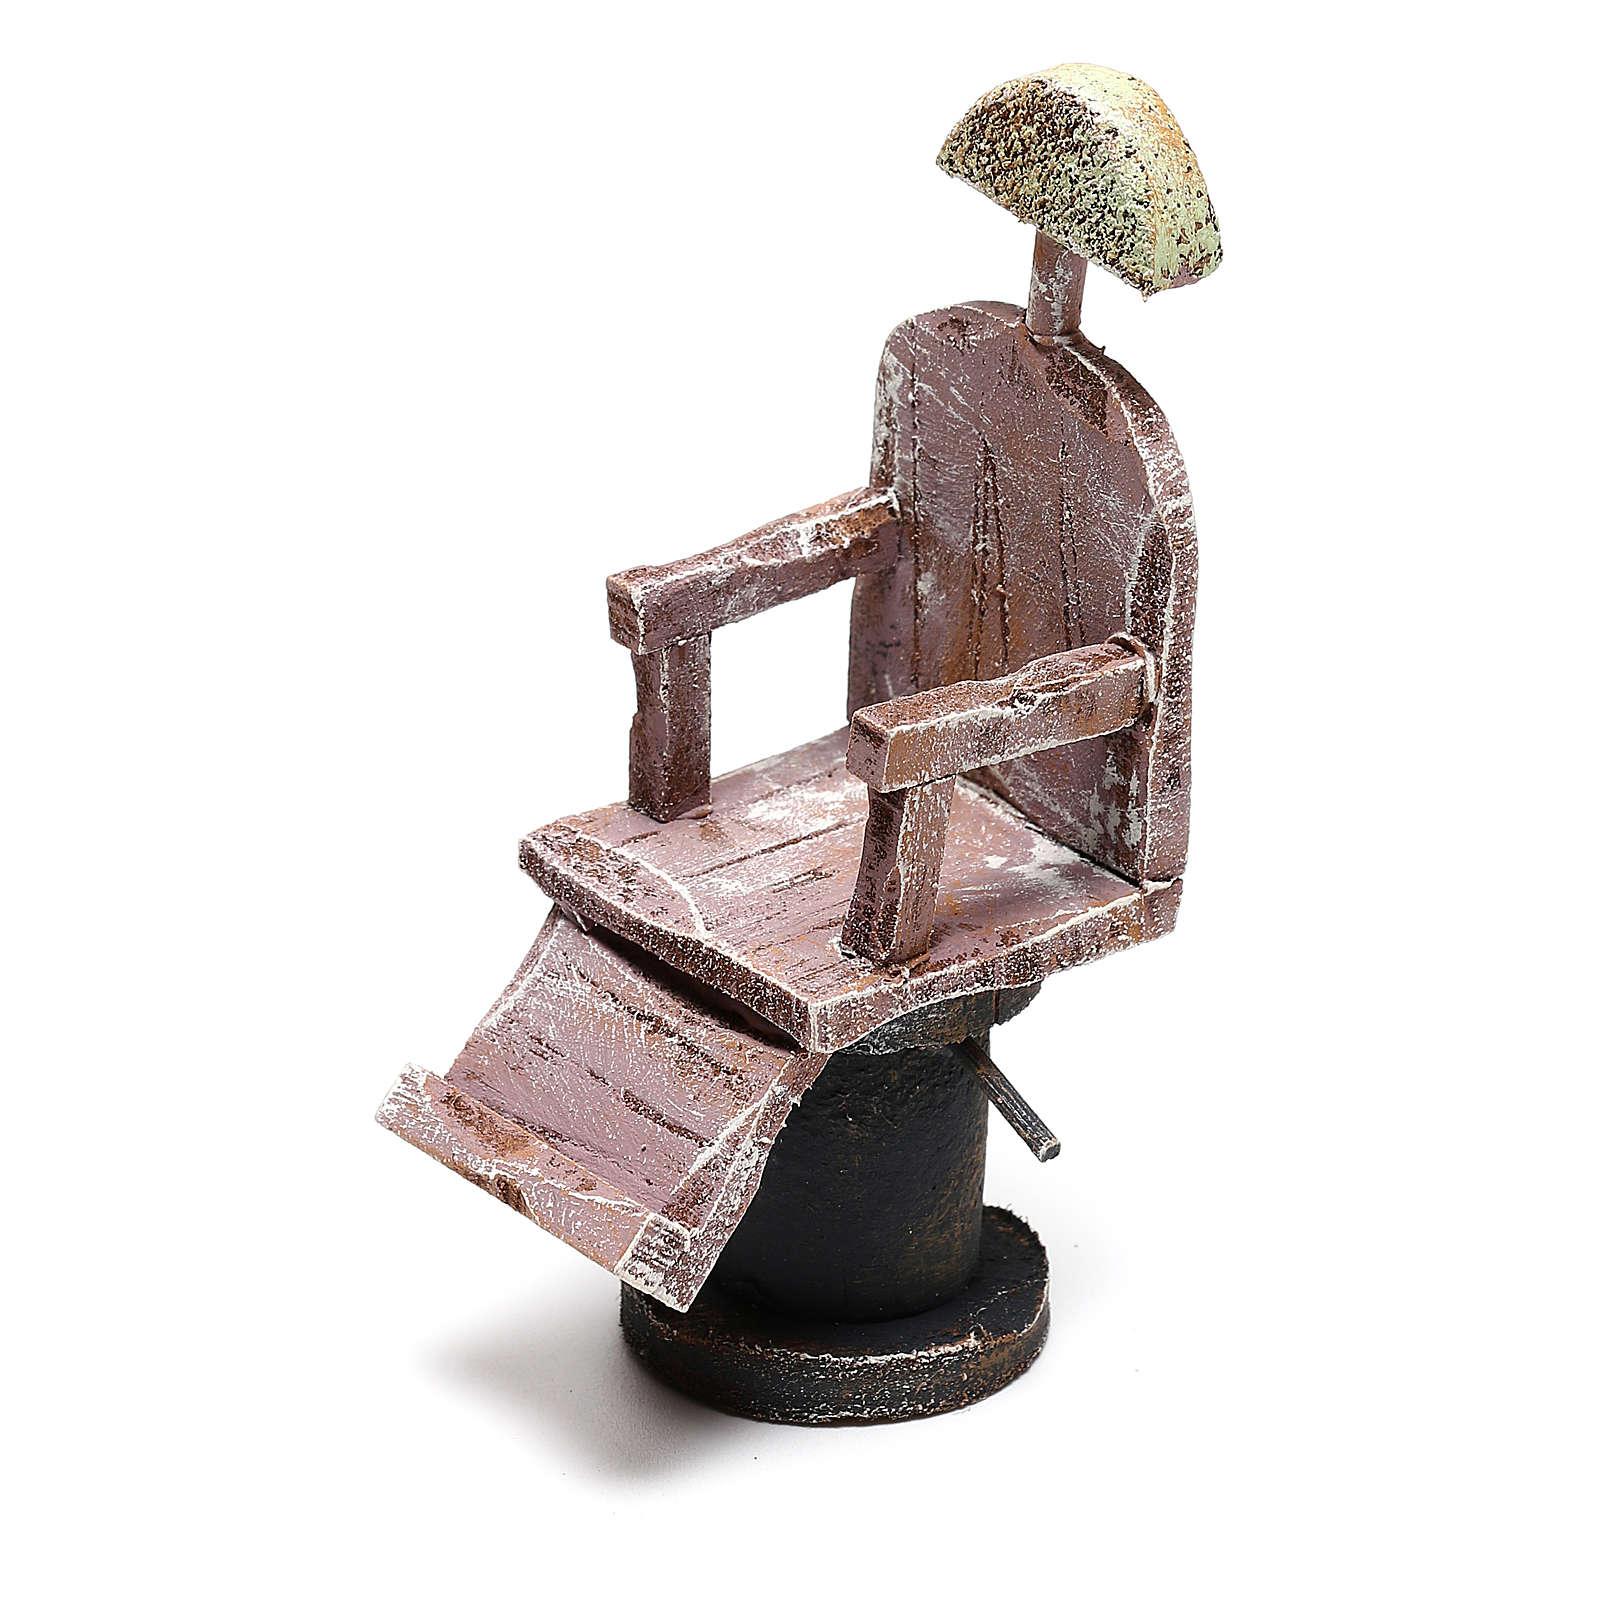 Barber chair Nativity scene 12 cm 4